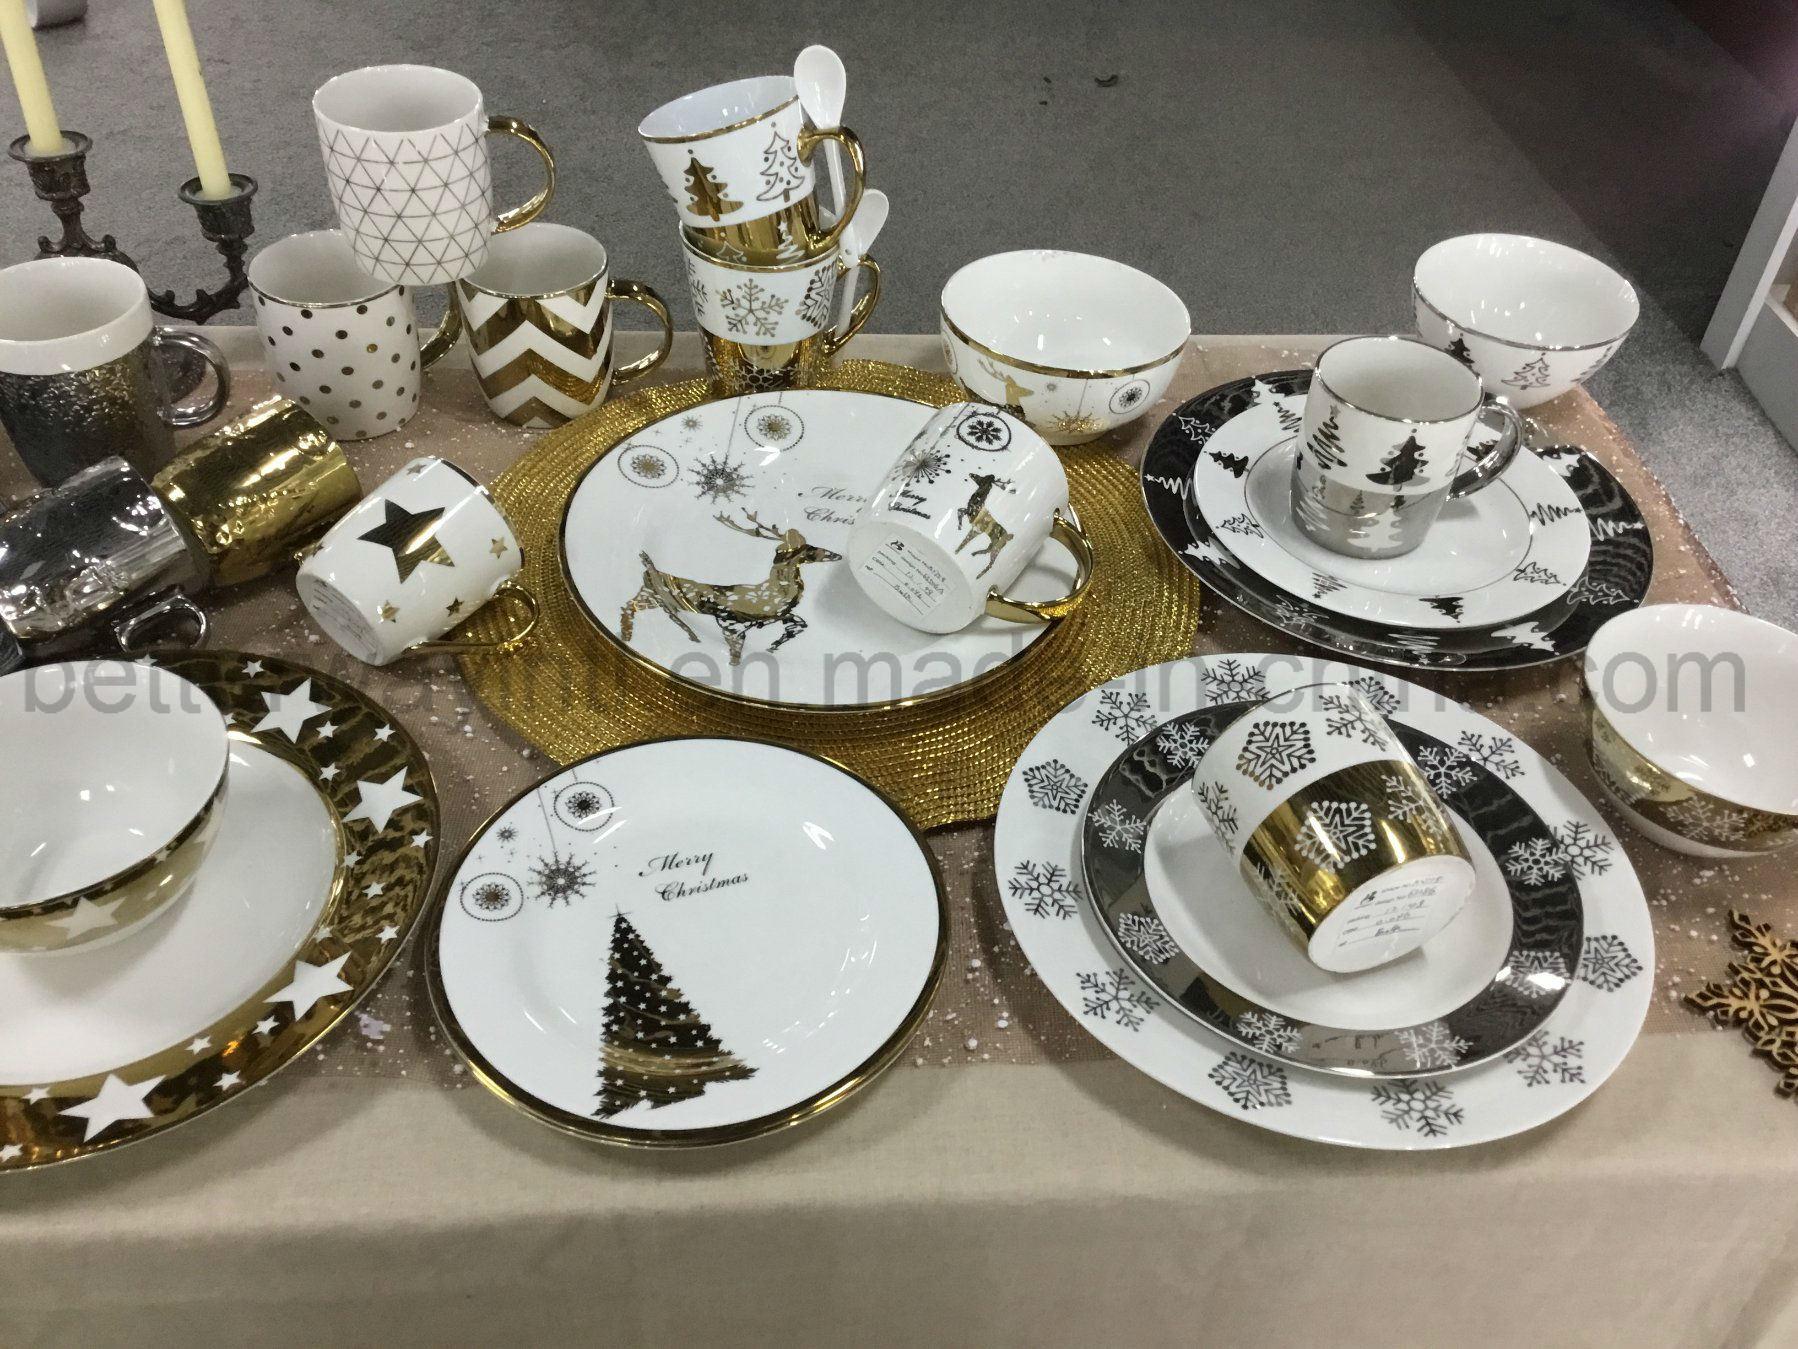 Christmas Plate Set.Hot Item New Bone China Dinner Set With Gold Christmas Design